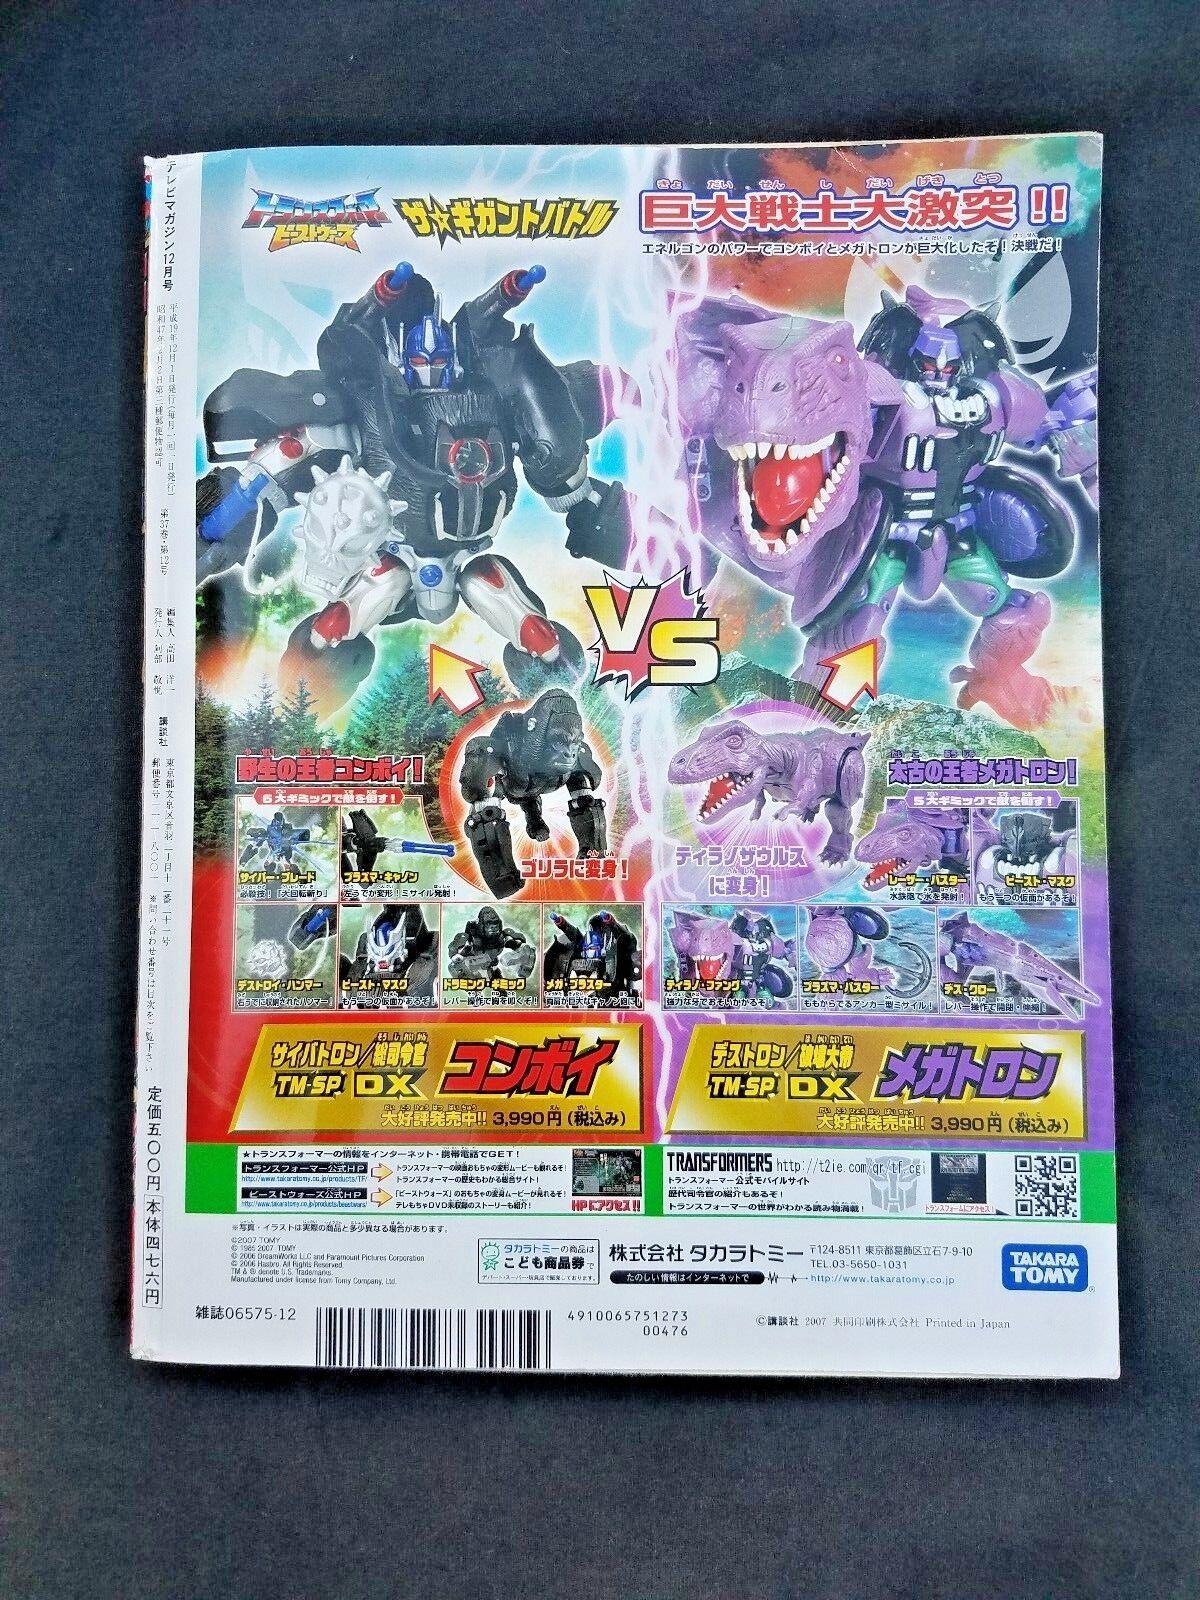 RARE Takara Tomy Transformers Leader Class Magazine 2007 Telebi 12 RARE